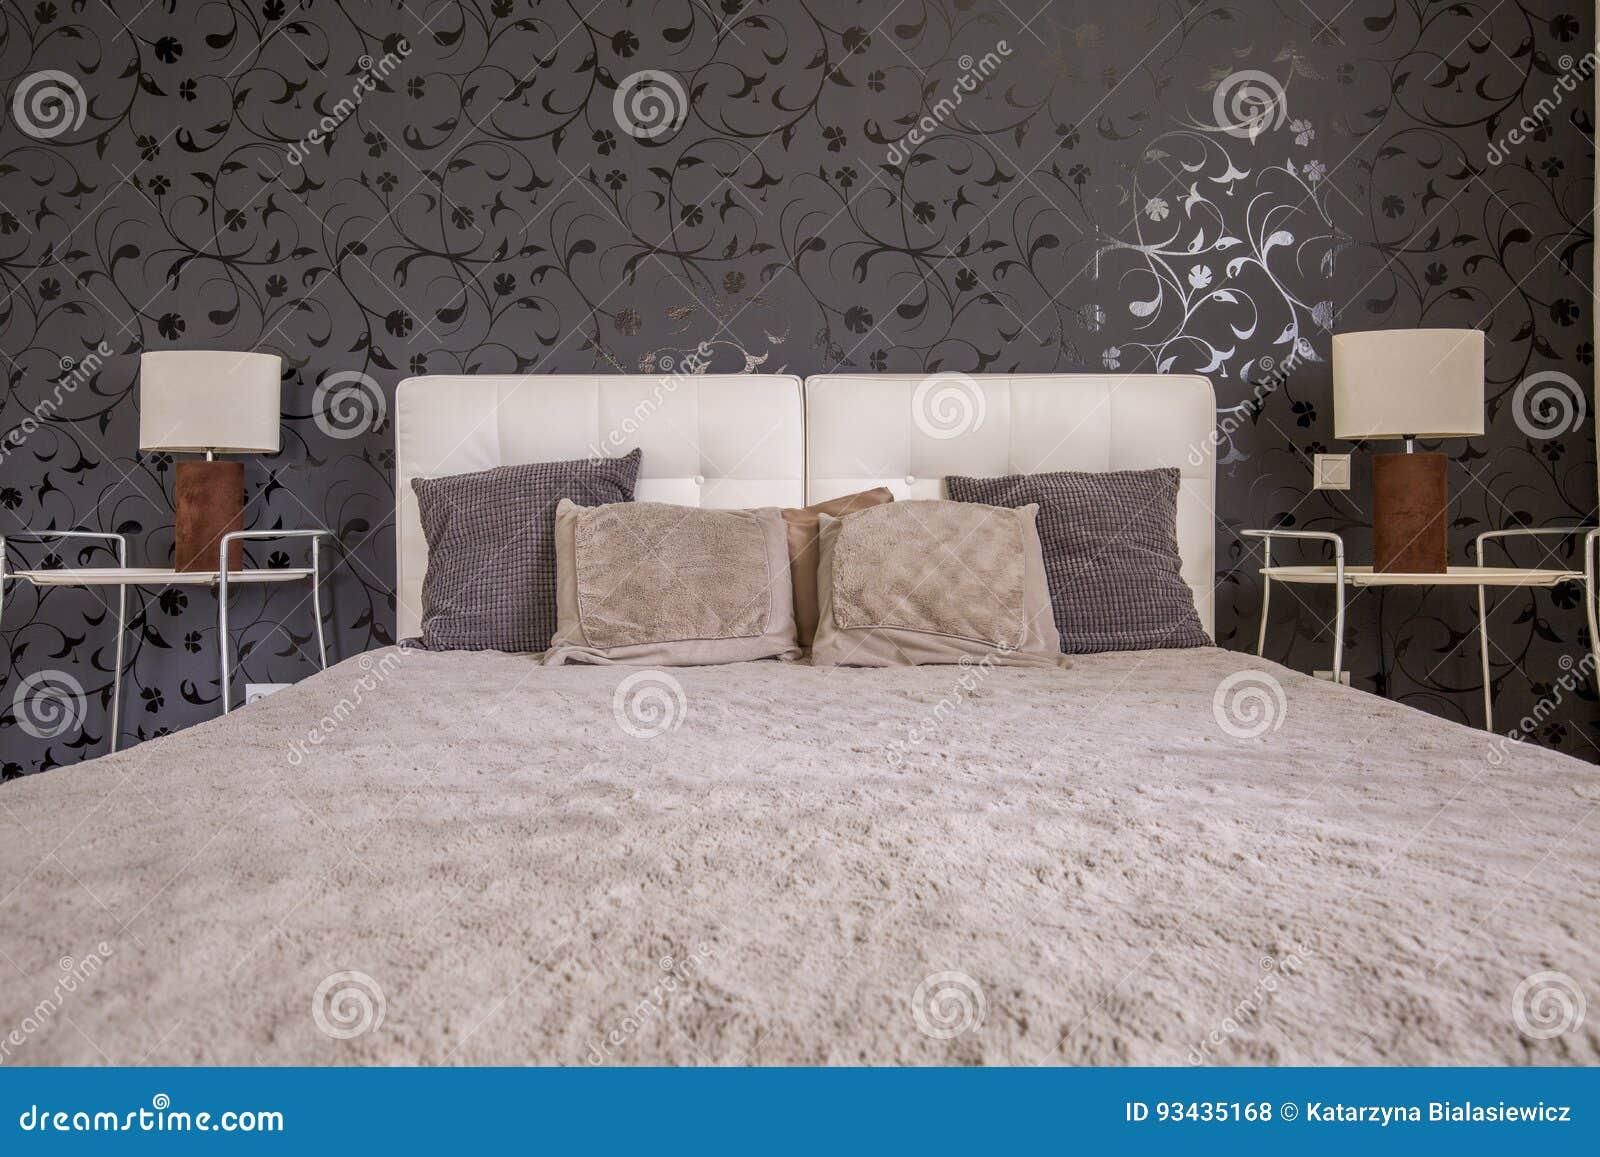 donkere slaapkamer met tweepersoonsbed